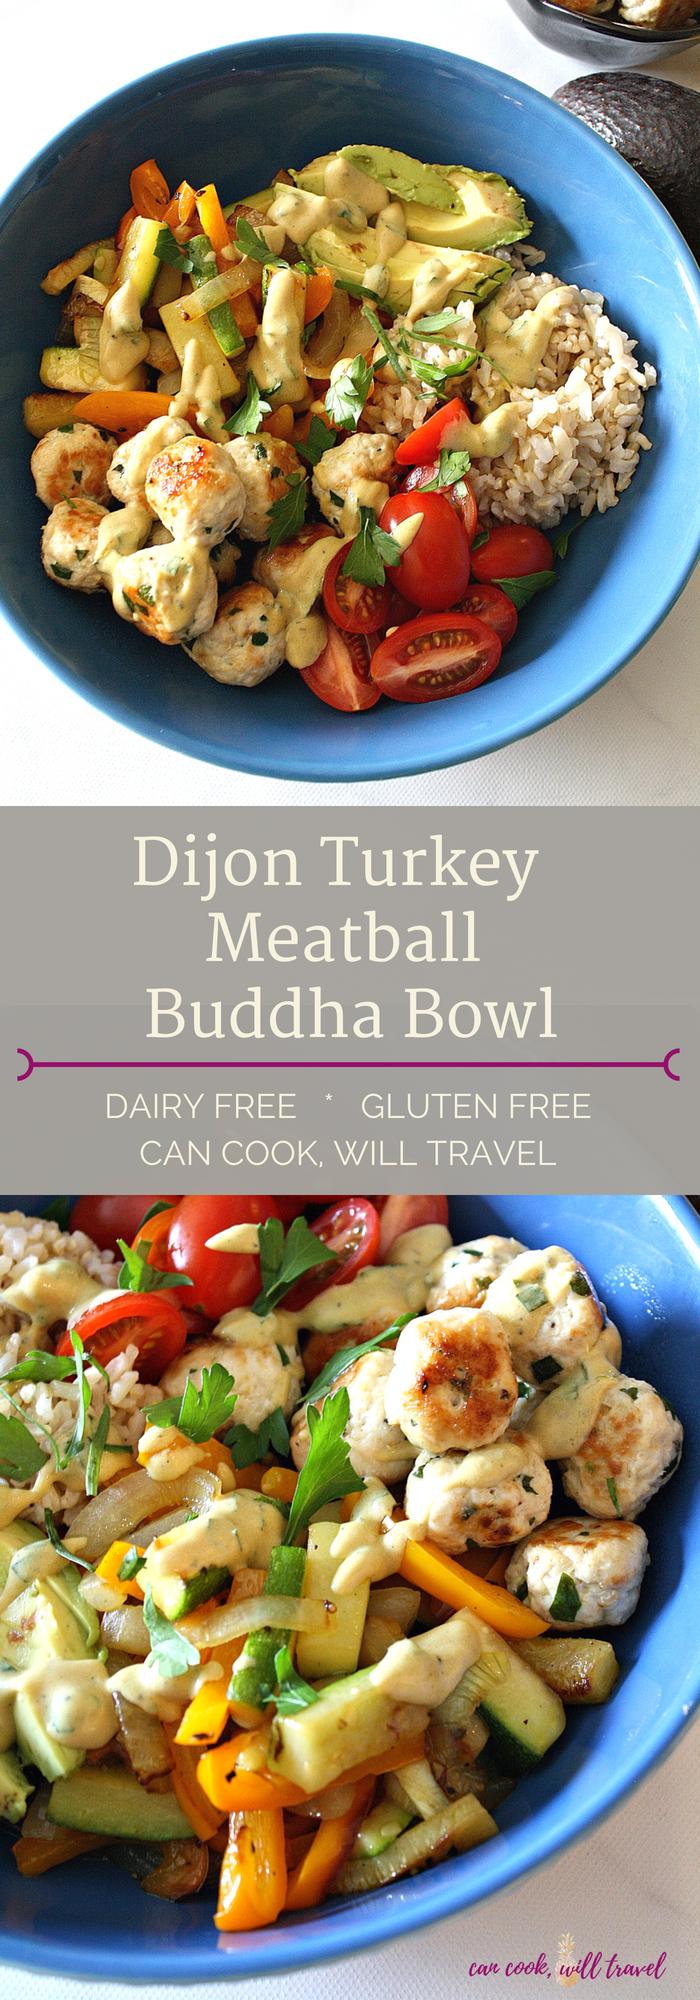 Dijon Turkey Meatball Buddha Bowl_Collage1